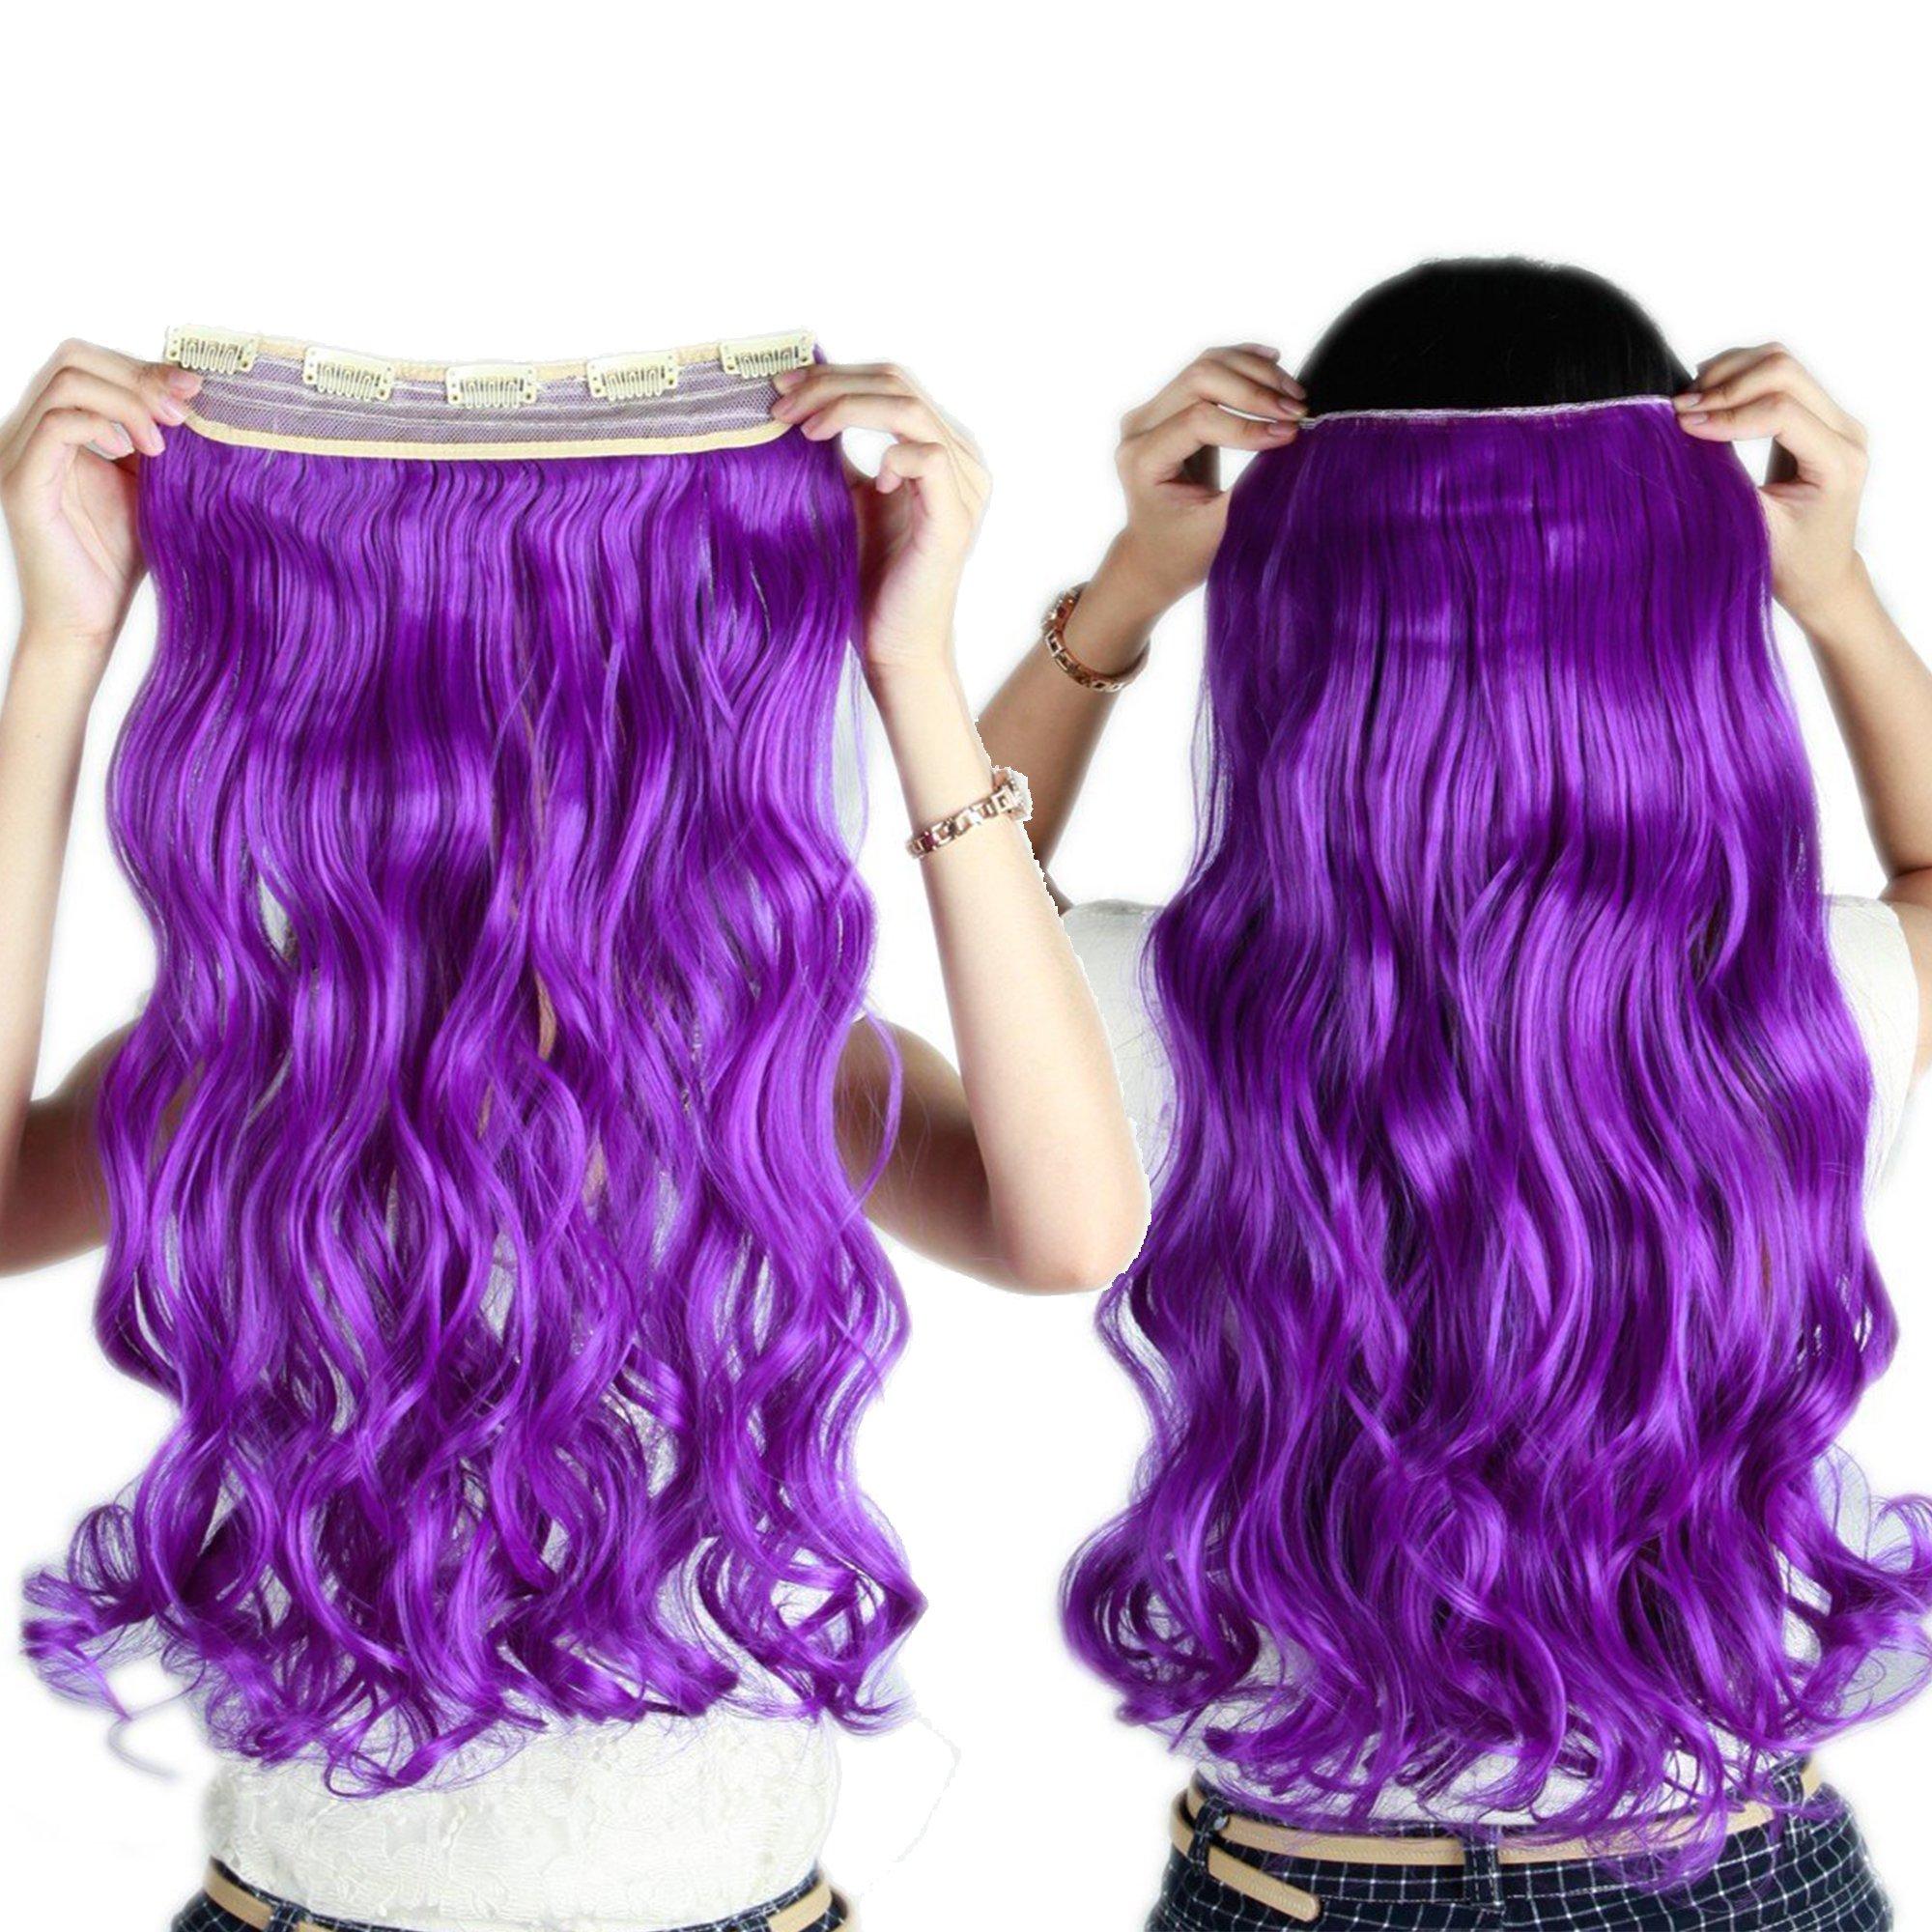 Amazon Agptek 26 Enstyle Supreme Neon Tangle Curly Hair